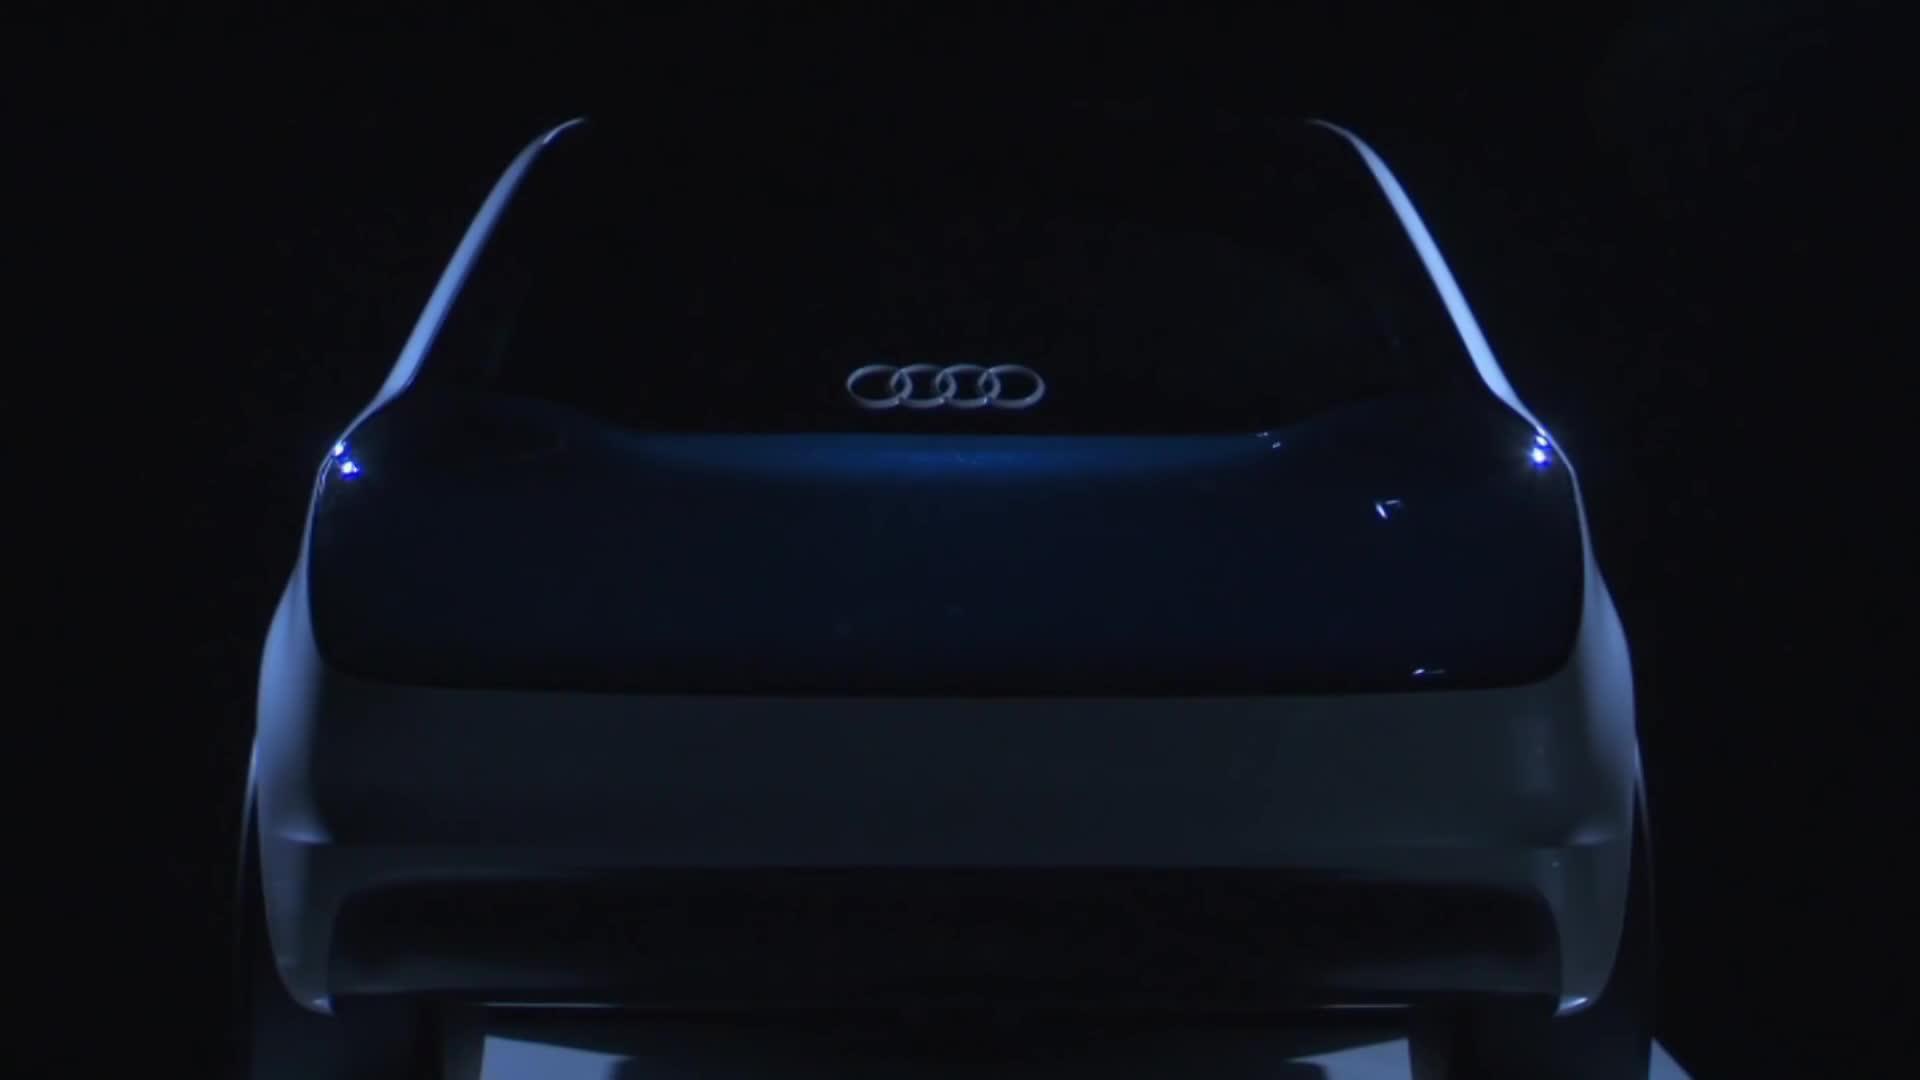 RocketLeague, red oled panels, the swarm, Audi OLED - The swarm - 2013 Audi Concept Cars GIFs